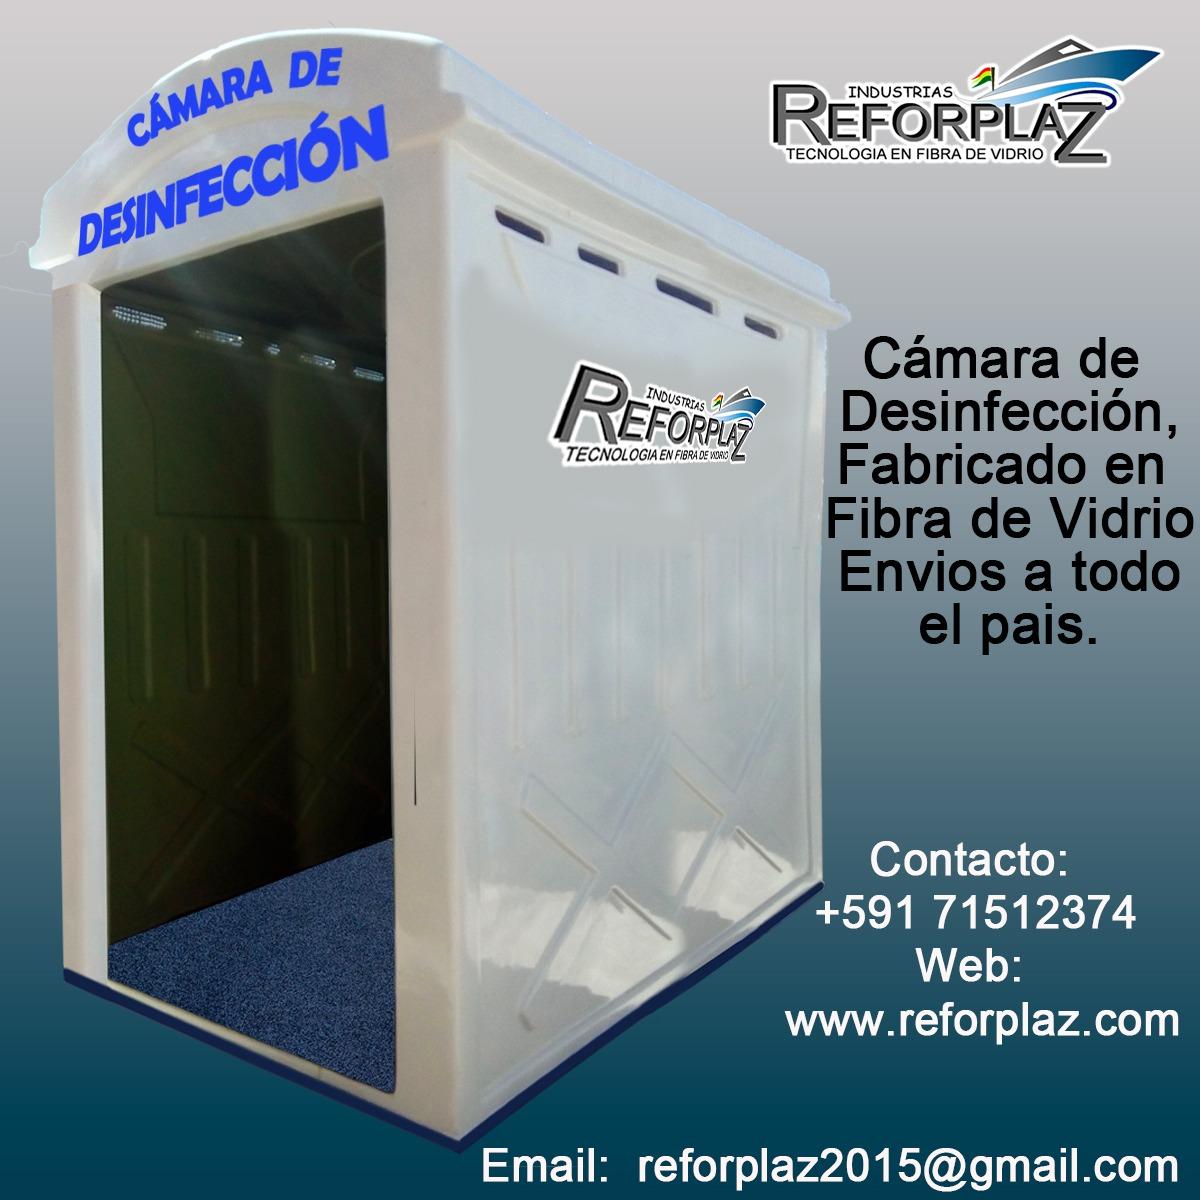 BANNERS  CAMARA DE  DESINFECCION  REFORPLAZ 2